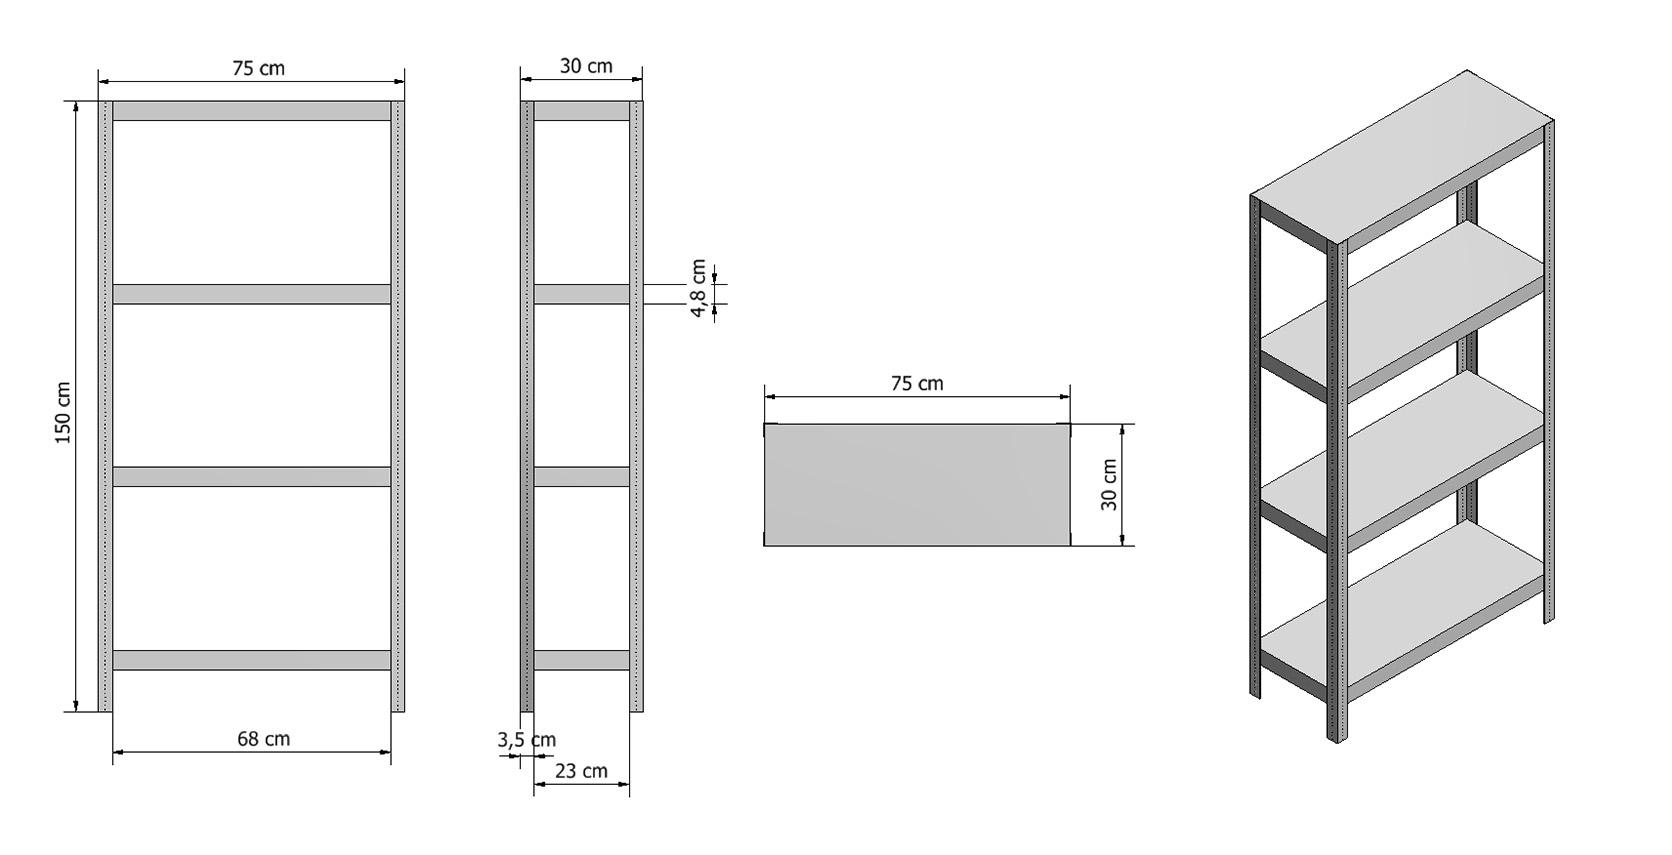 metallregal werkstatt keller regal ganz aus metall wei metis 75x30 cm 2 h hen. Black Bedroom Furniture Sets. Home Design Ideas